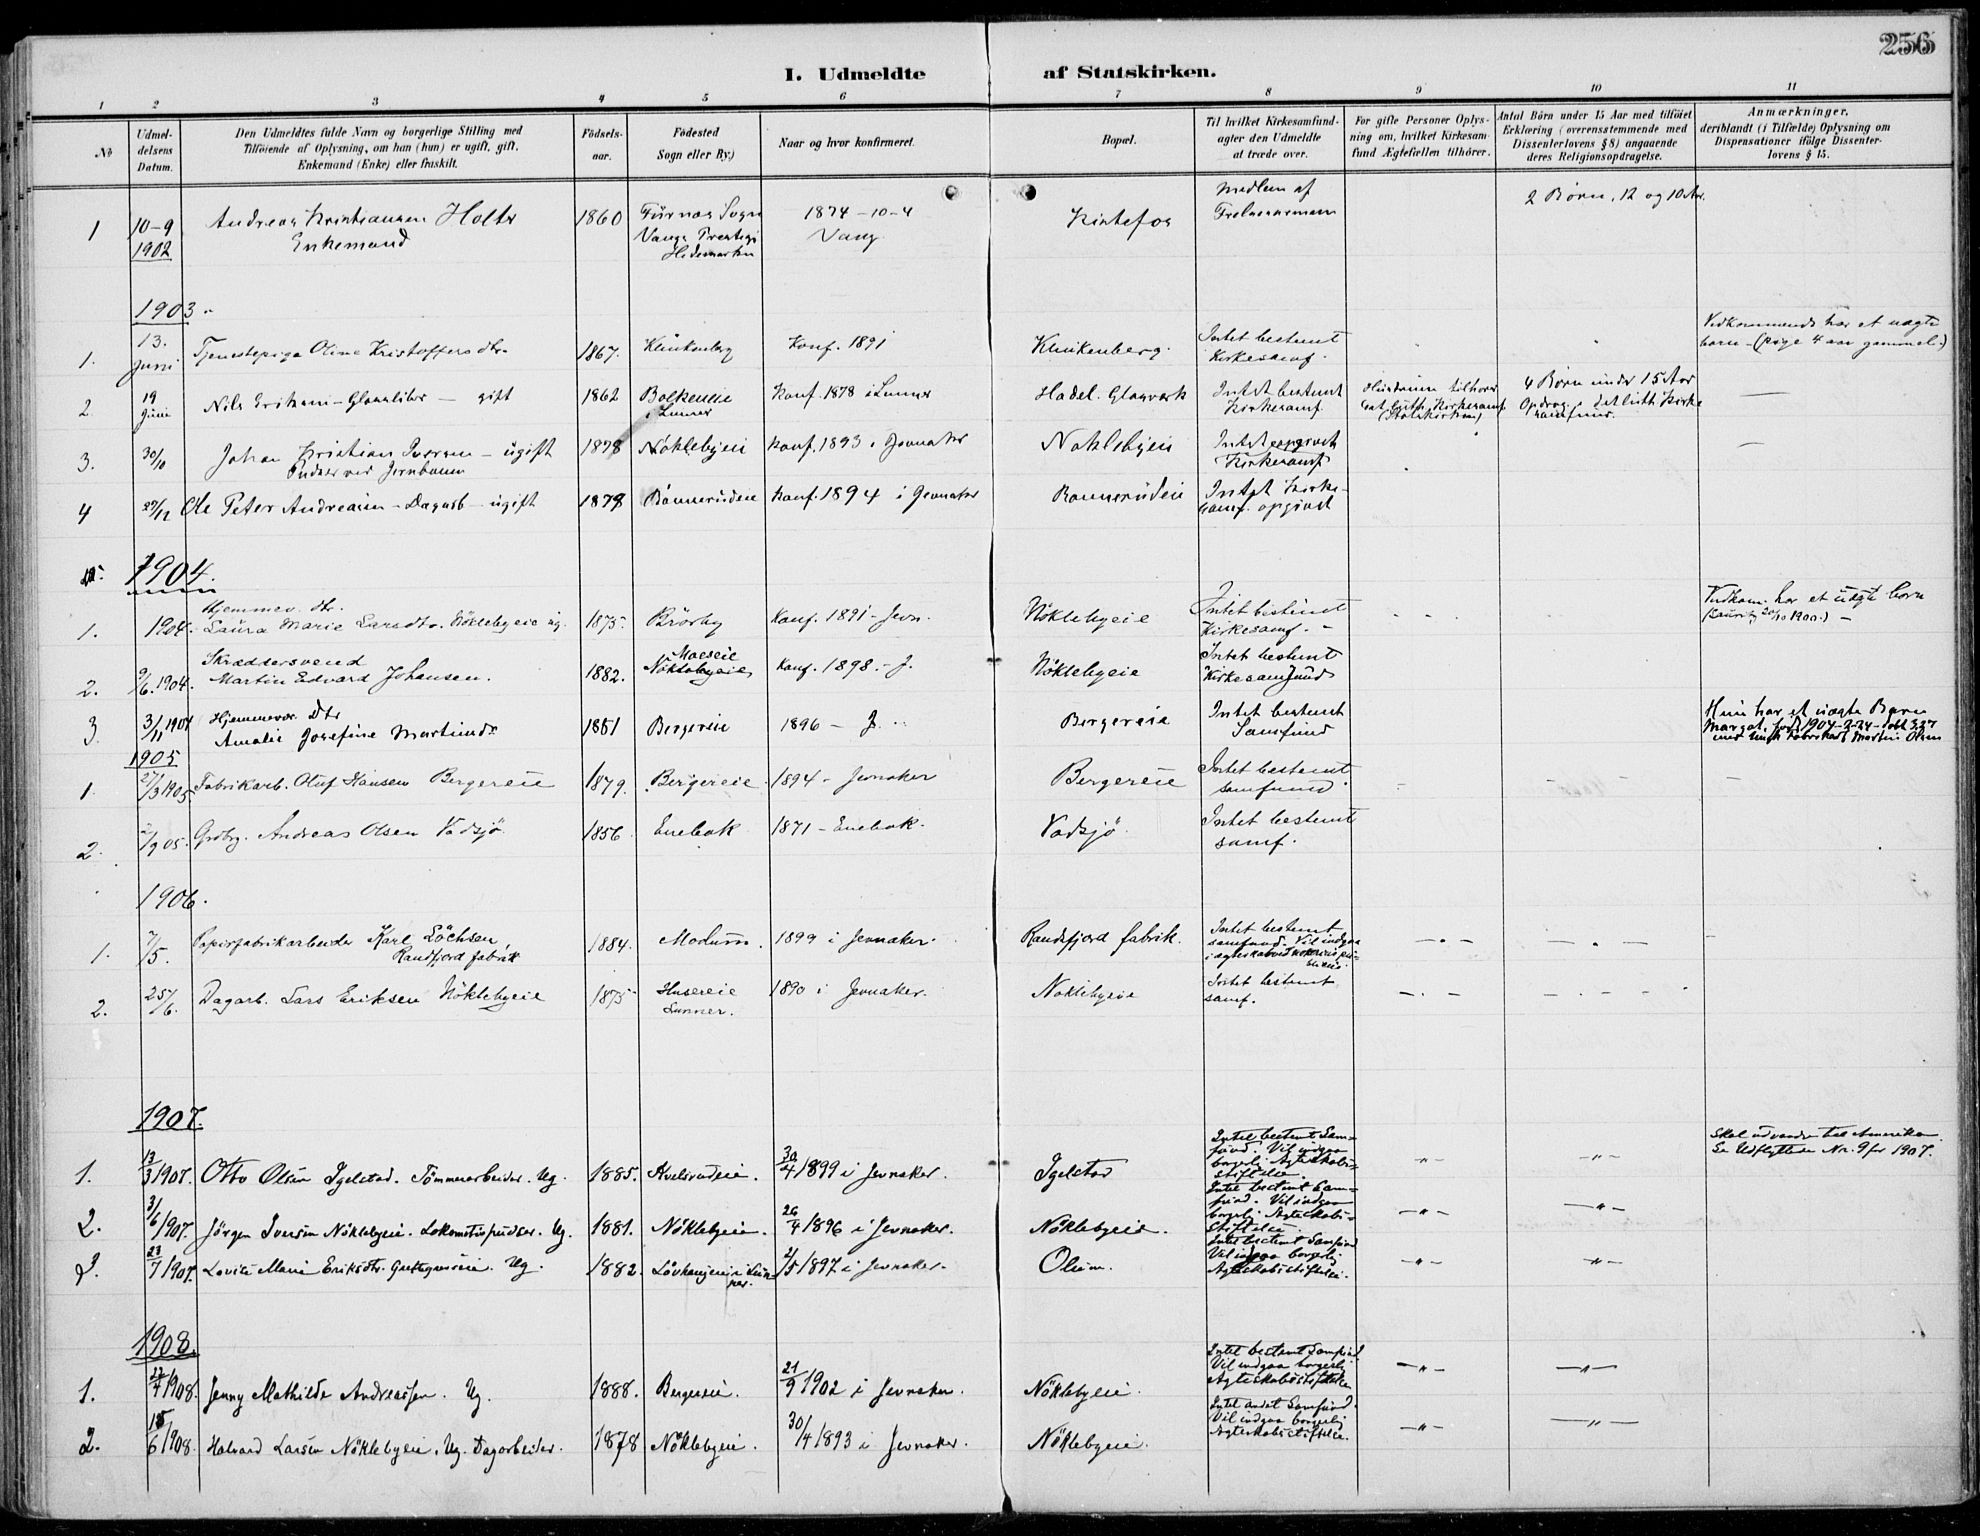 SAH, Jevnaker prestekontor, Ministerialbok nr. 11, 1902-1913, s. 256